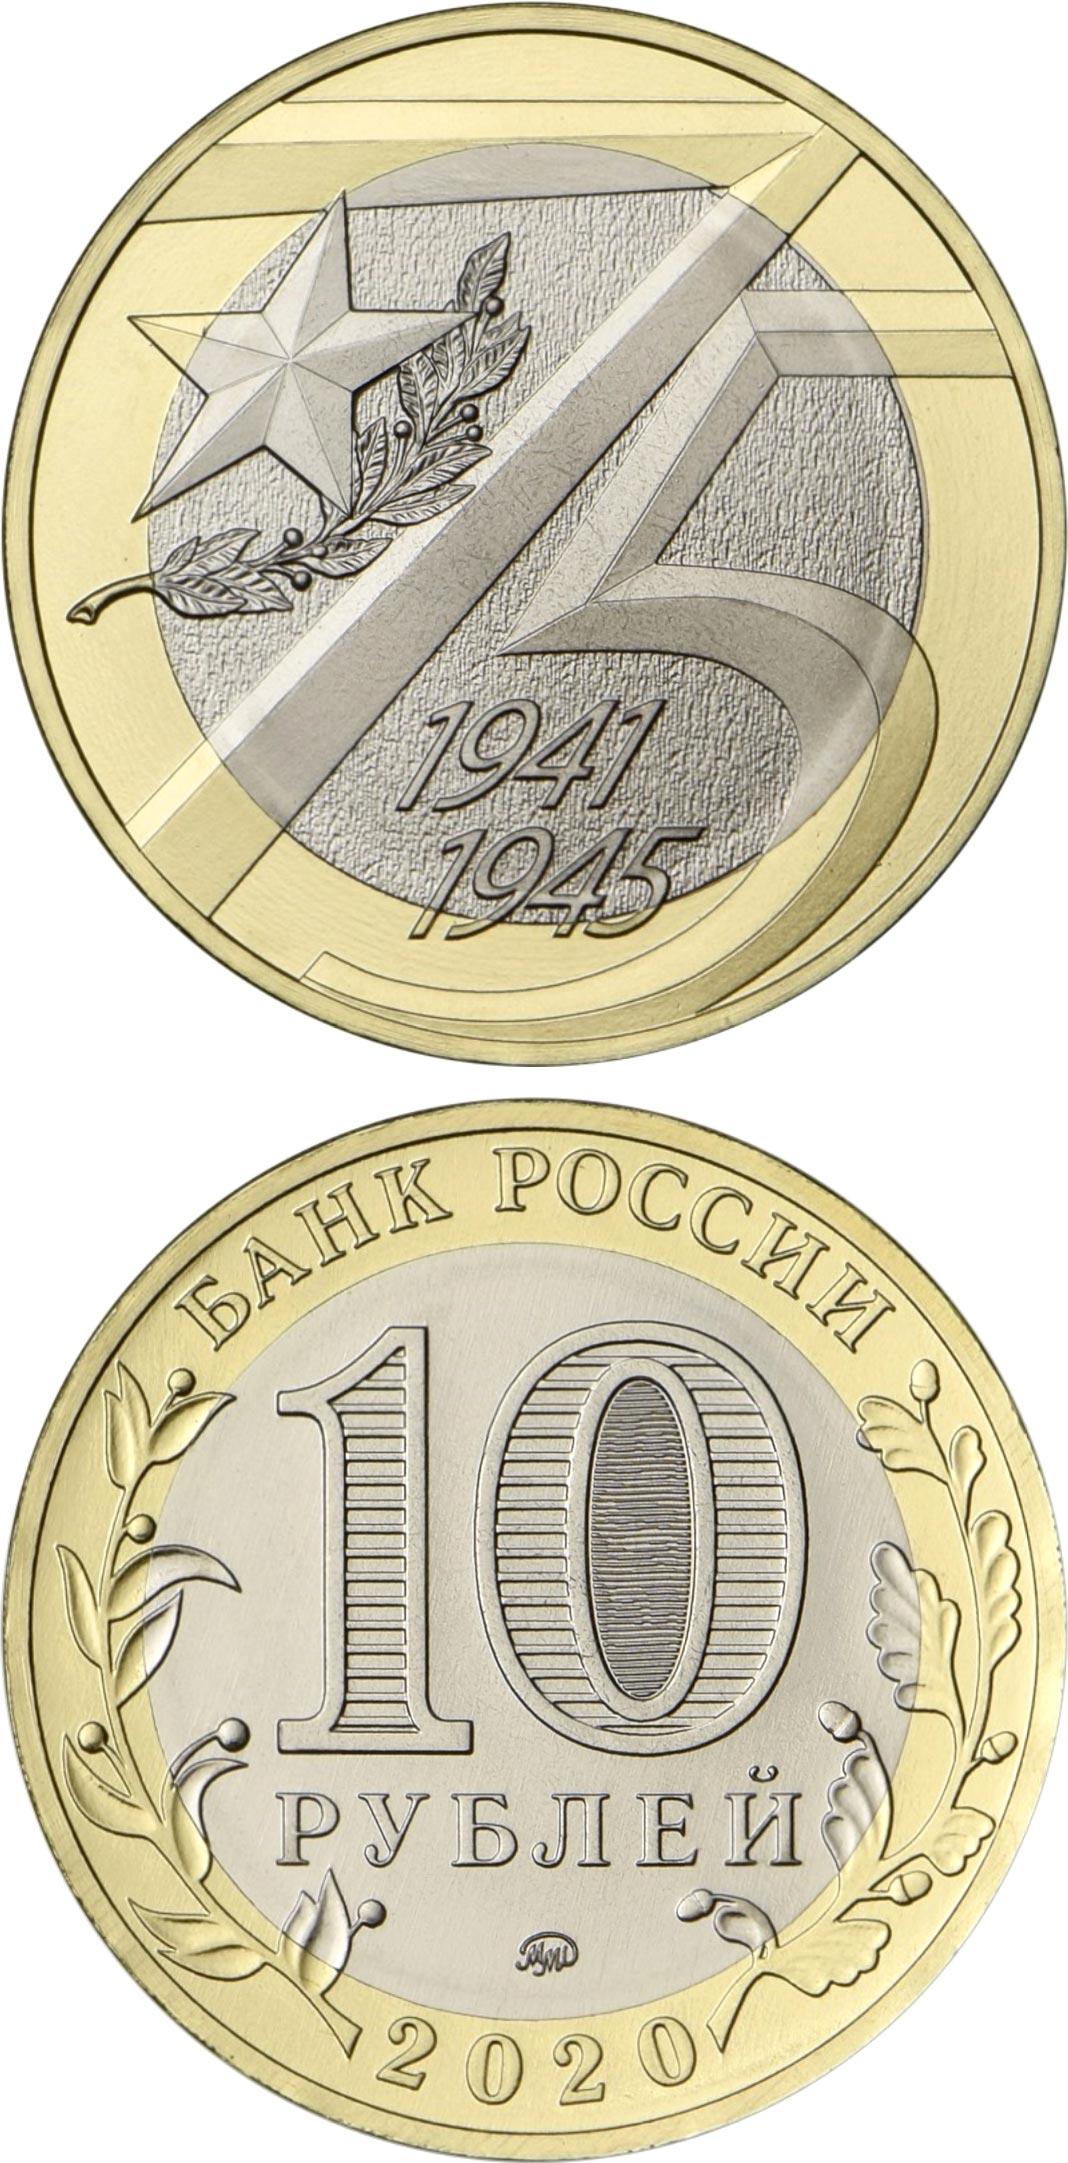 The Republic of North Ossetia-Alania Bi-Metallic Russia 2013 10 Roubles